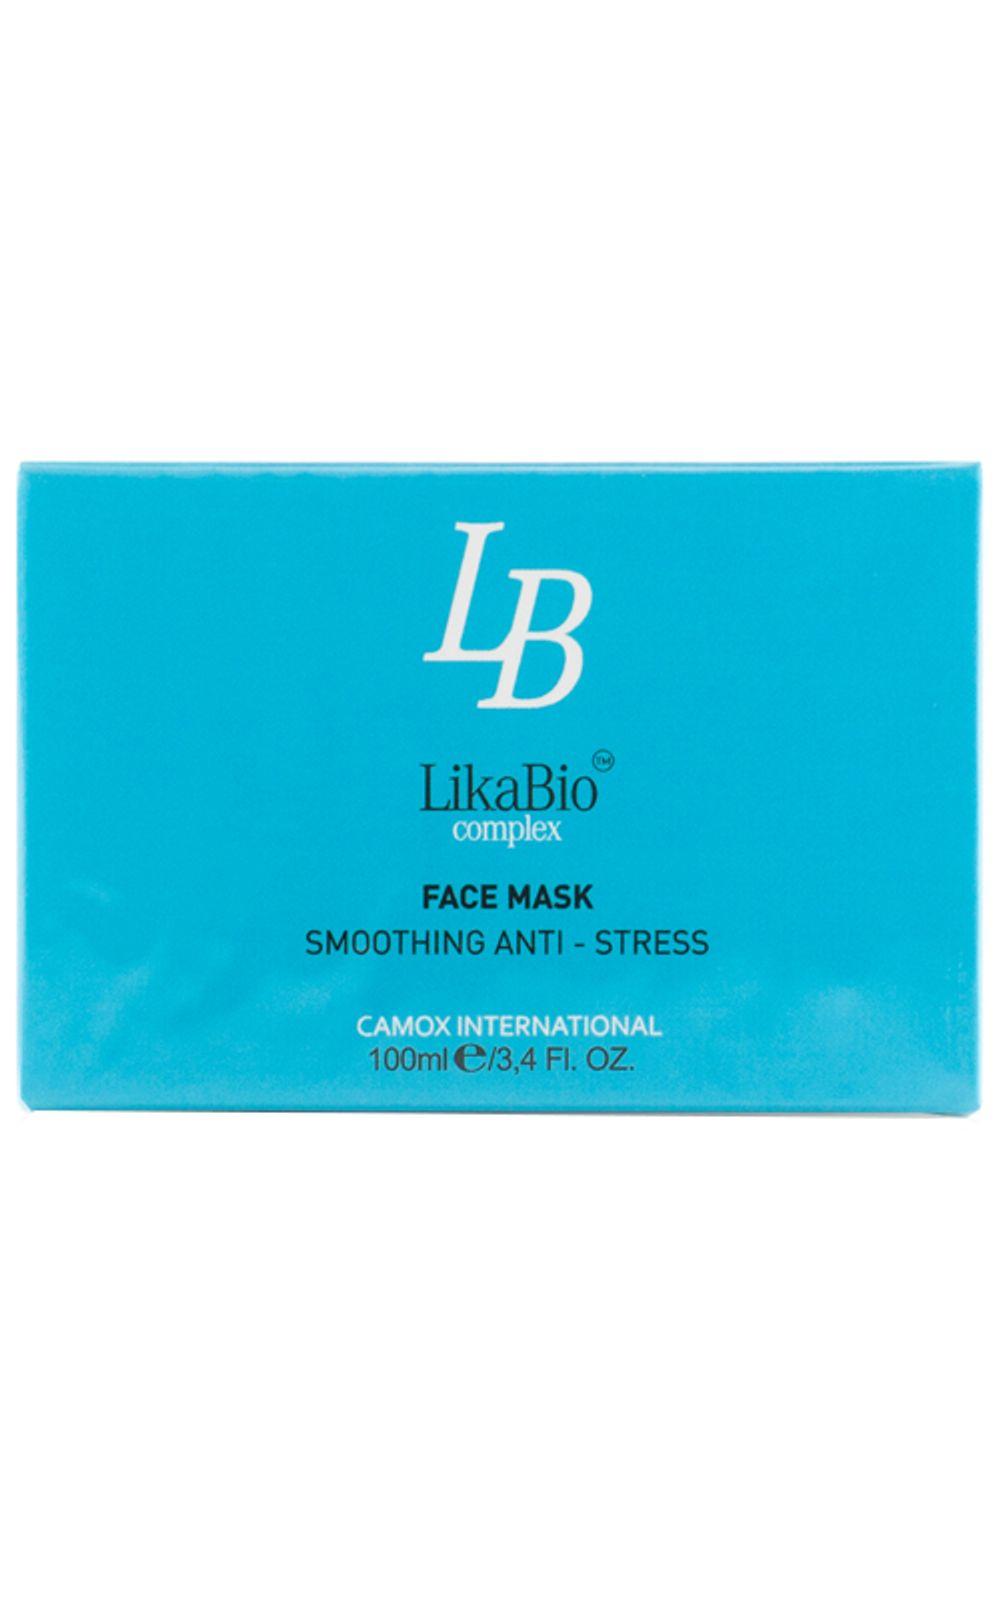 Foto 2 - Máscara Facial LikaBio  - Face Mask Smoothing Anti-Stress - 100ml